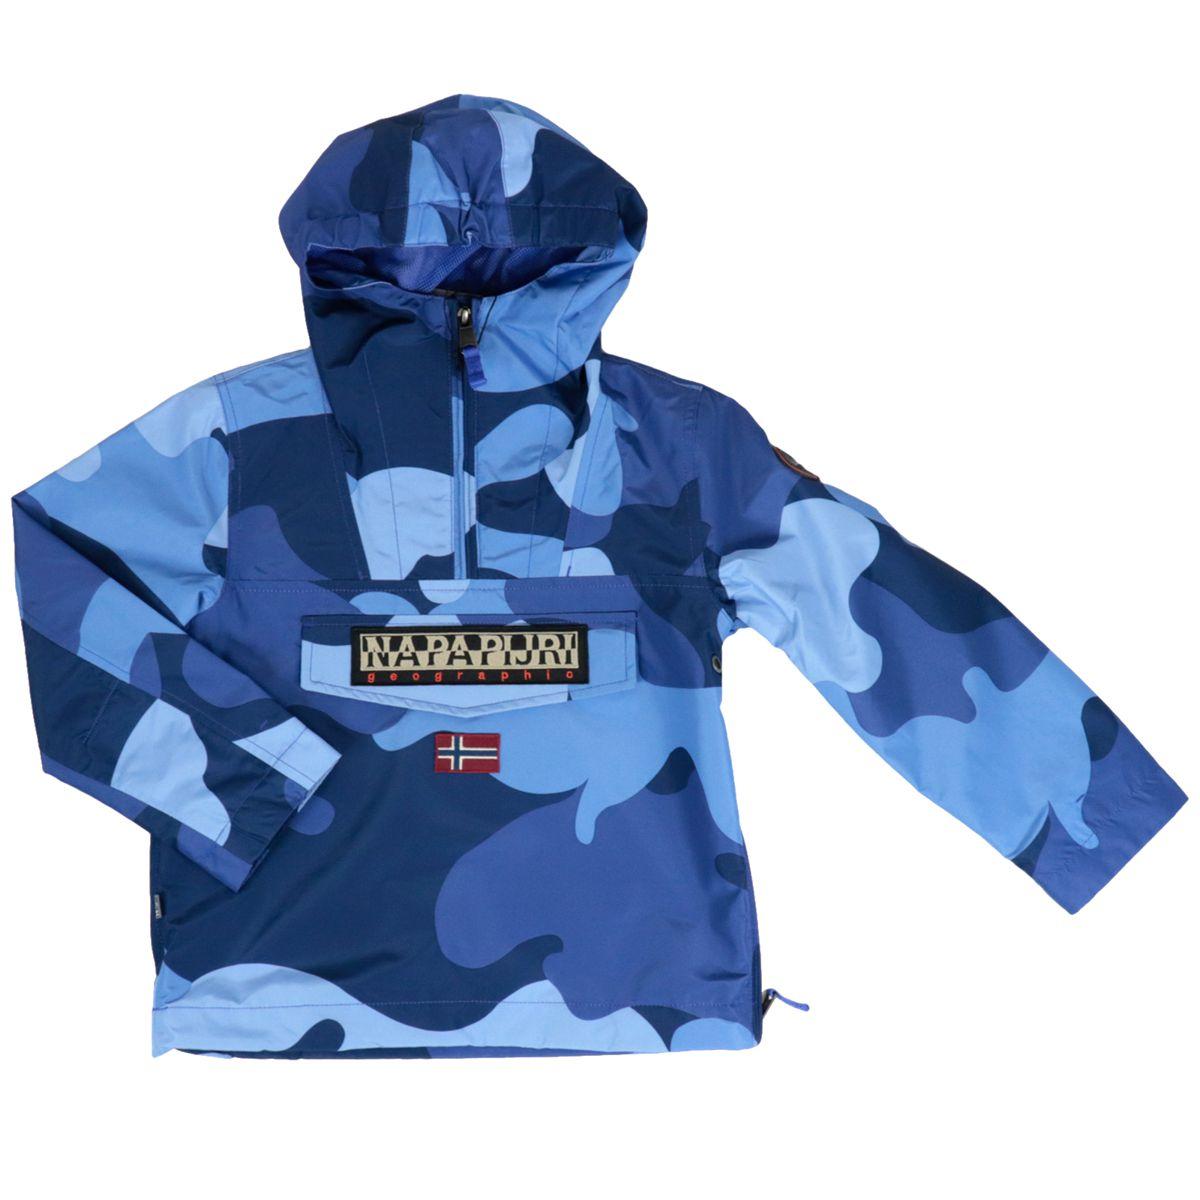 Rainforest polyamide jacket with camouflage print Blue camouflage NAPAPIJRI